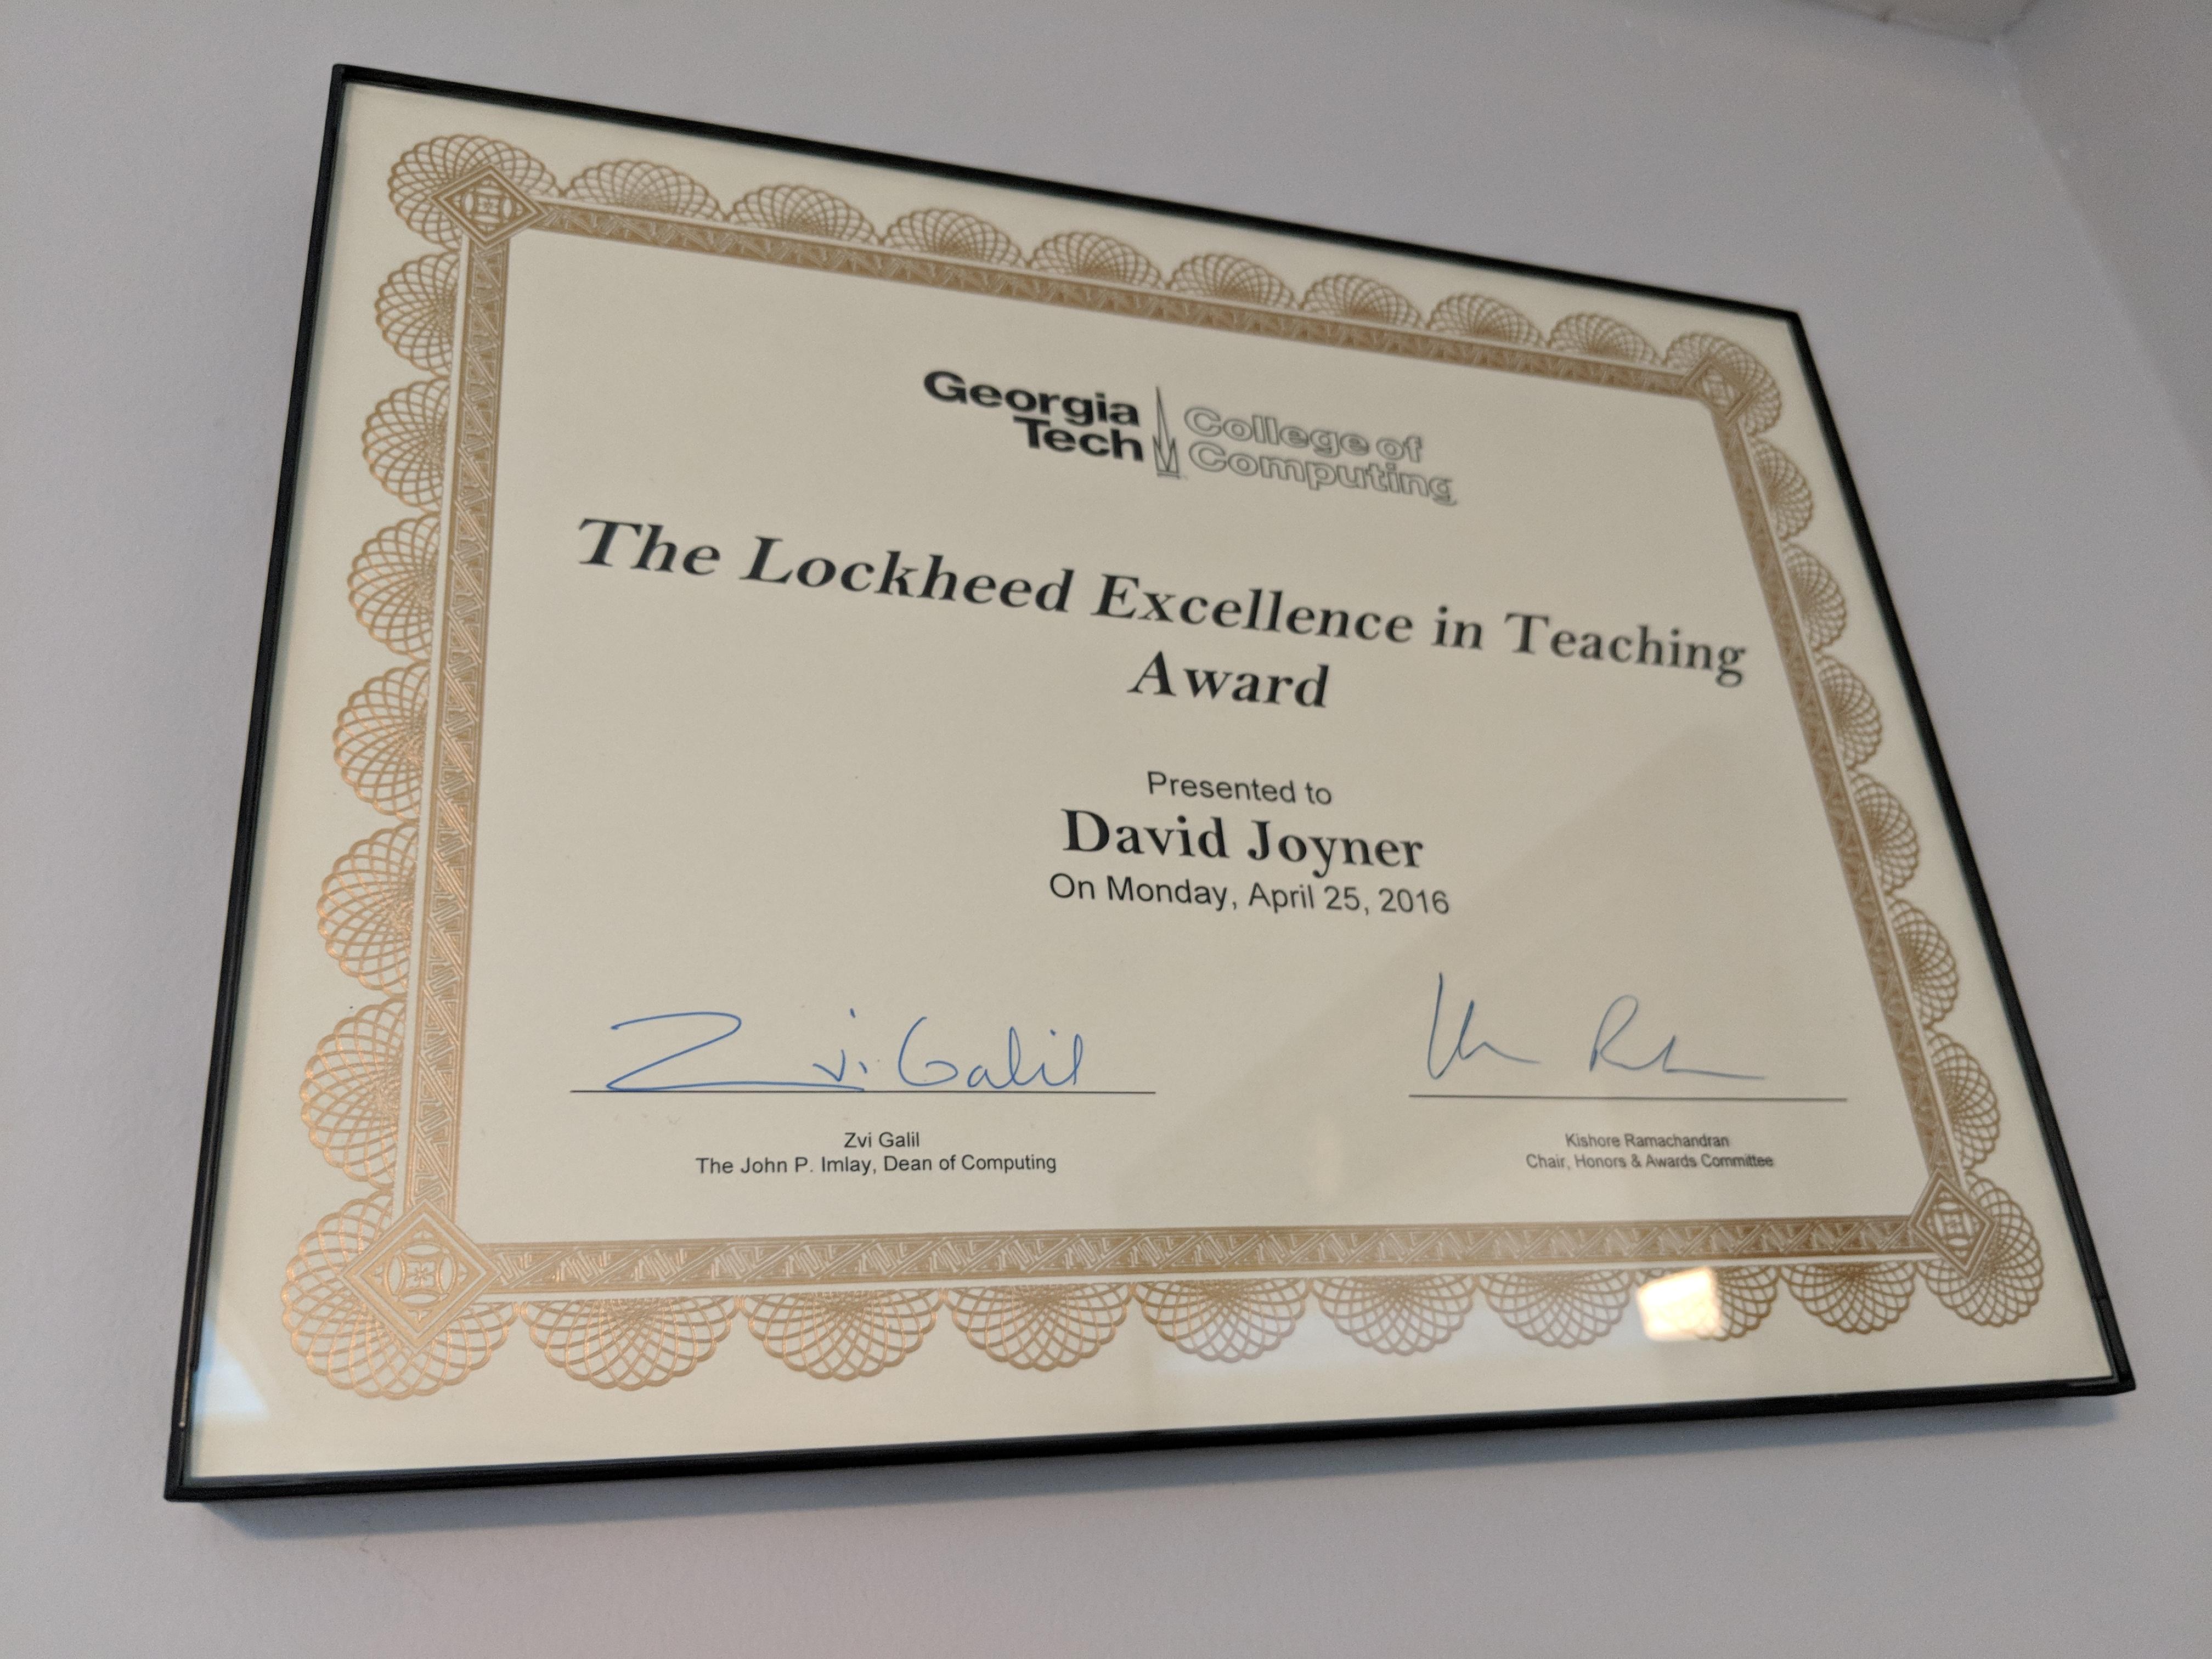 excellence teaching award georgia tech lockheed won david ve